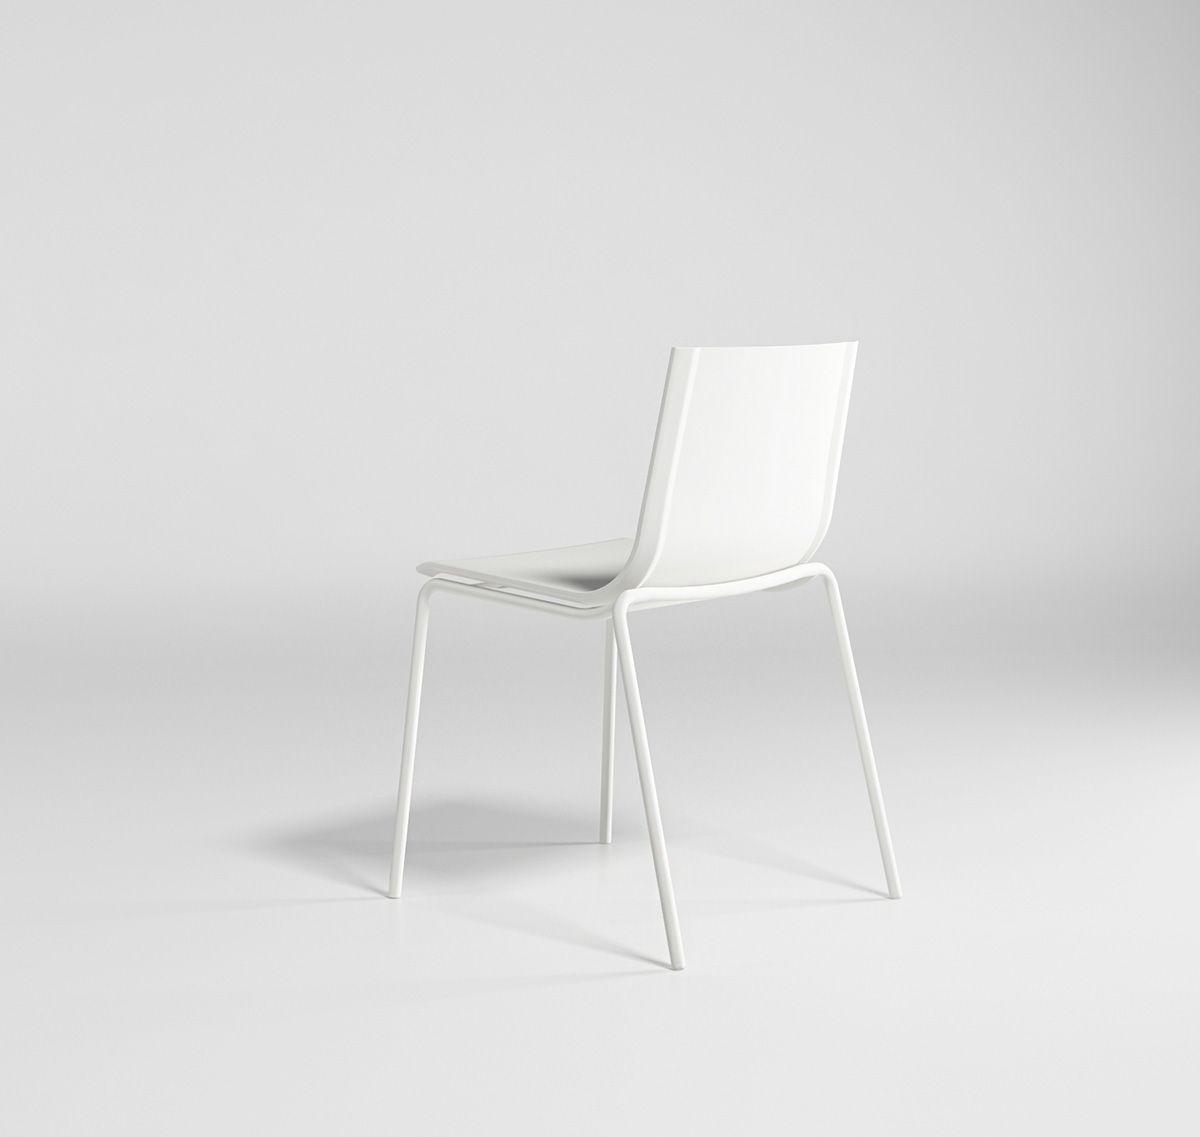 03-stack-system-chair-borja-garcia-gandiablasco